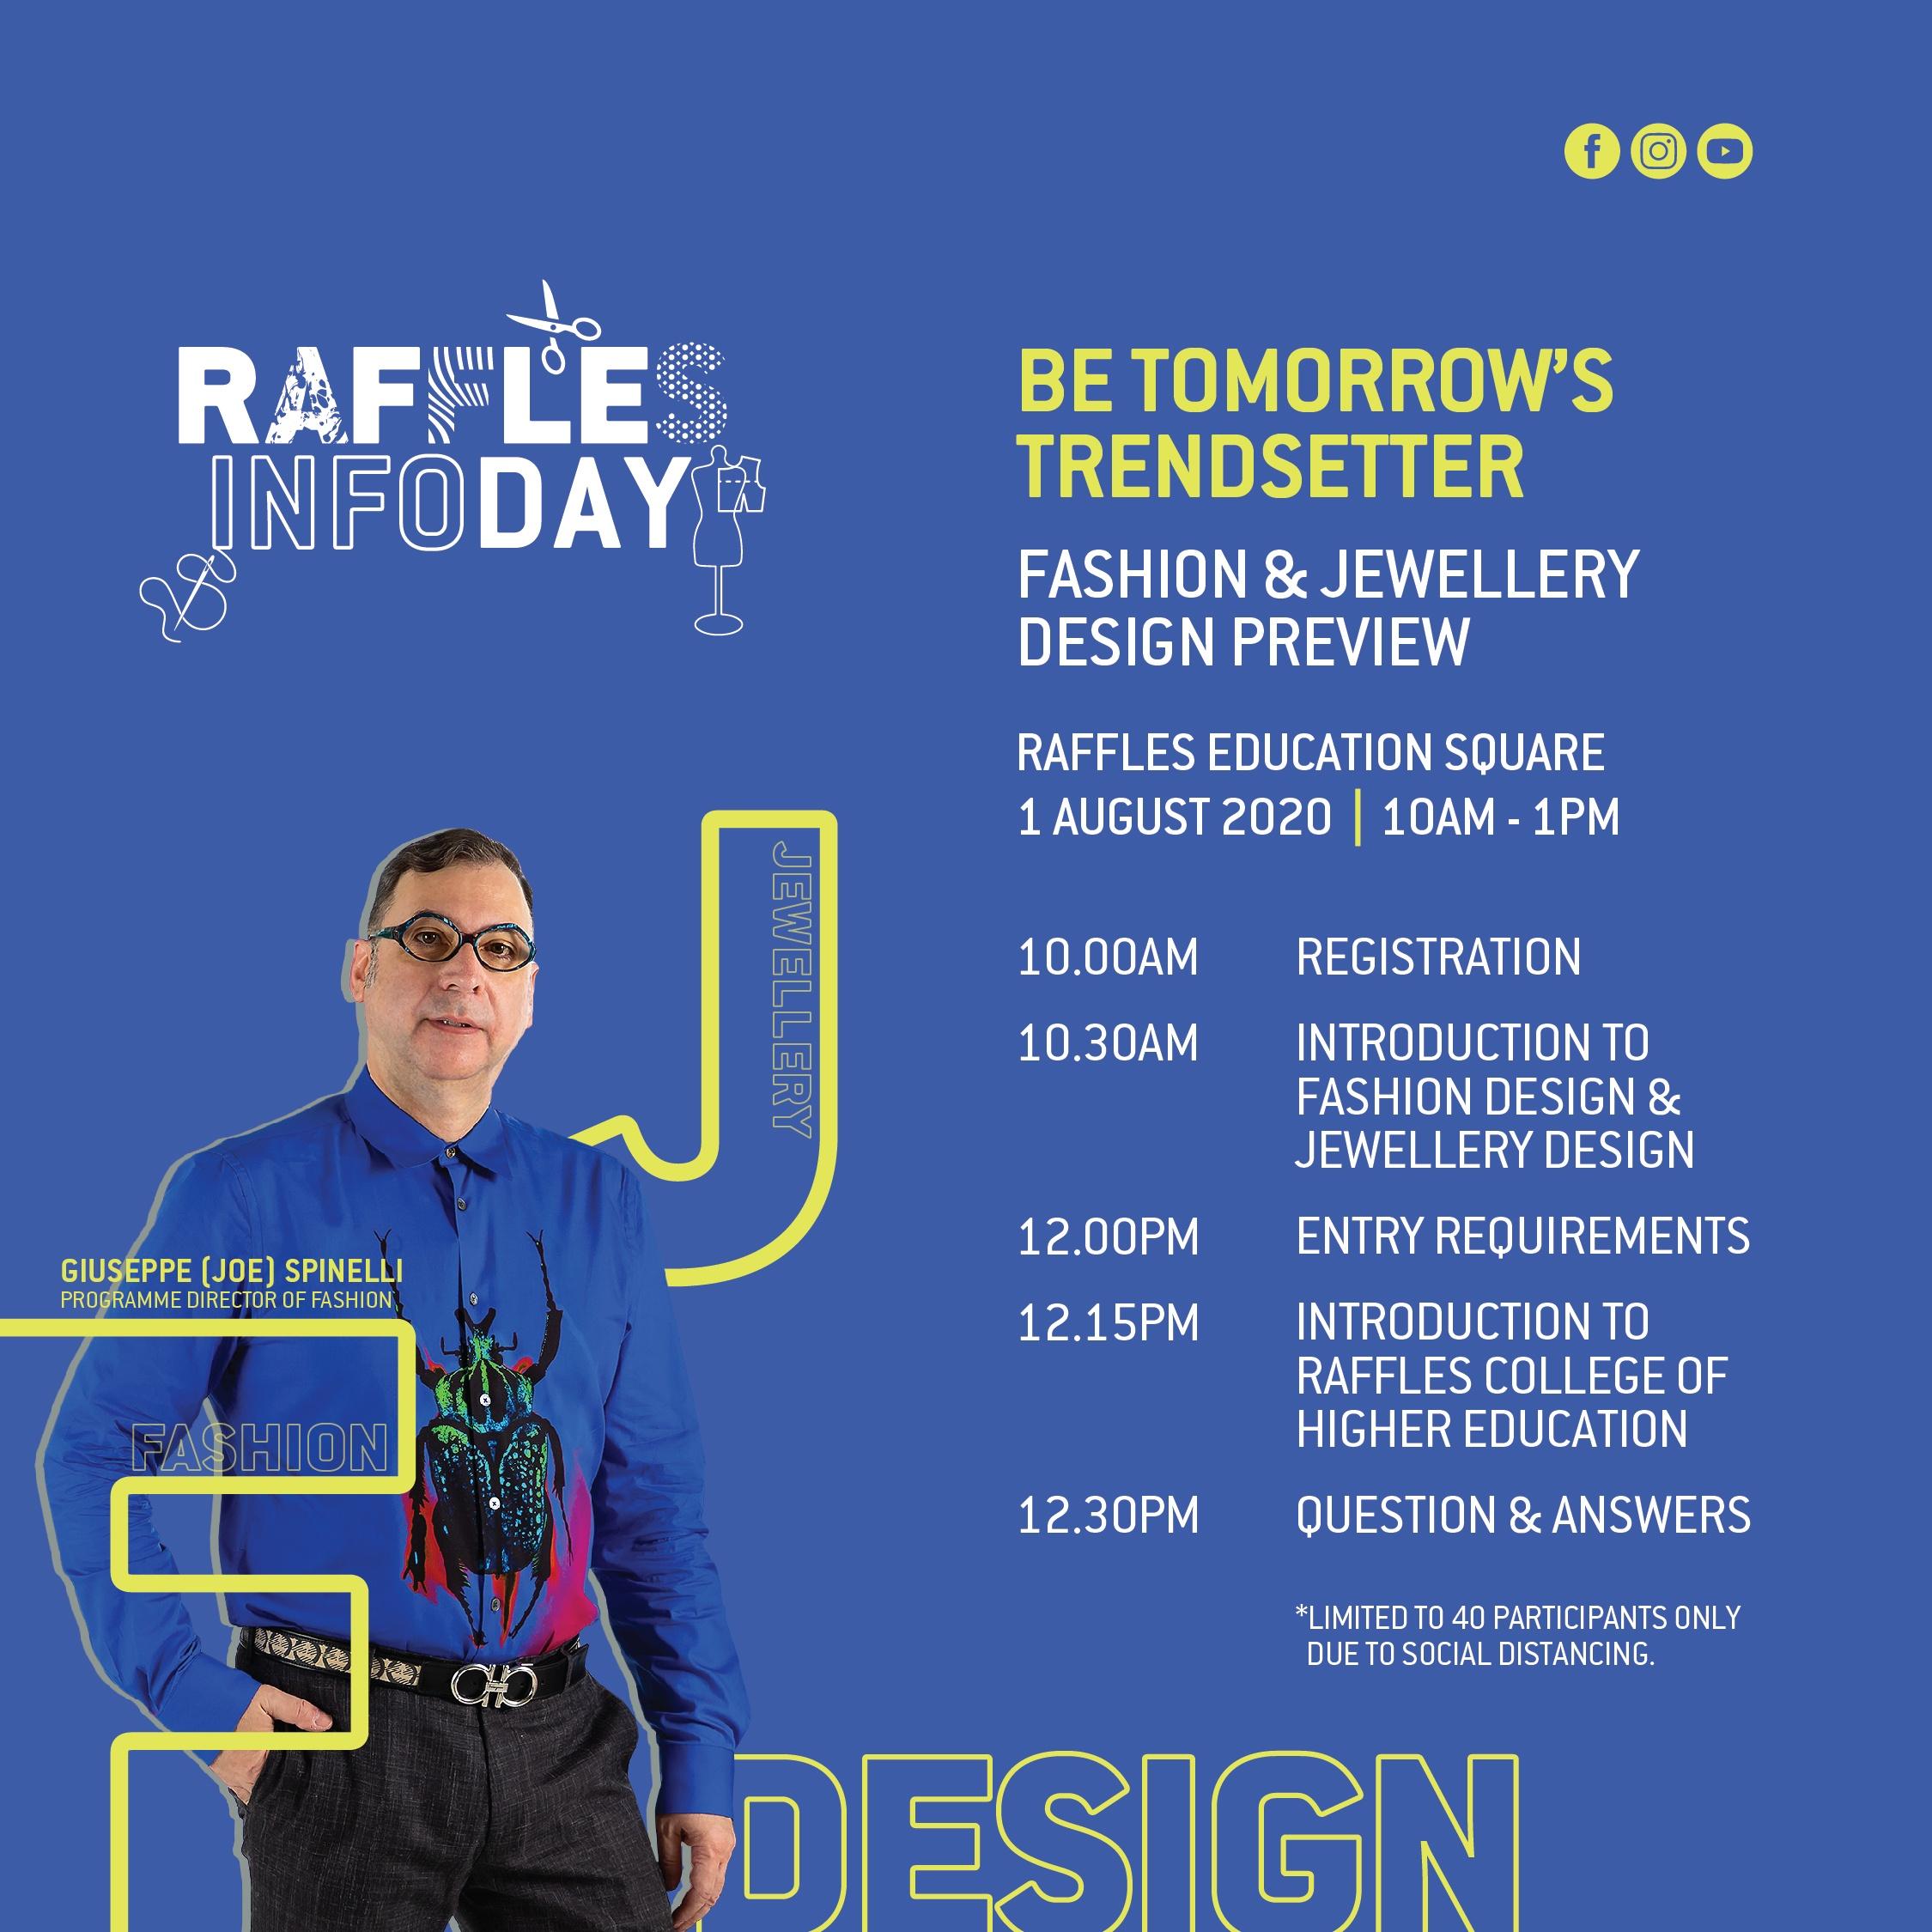 raffles infoday july 2020 poster